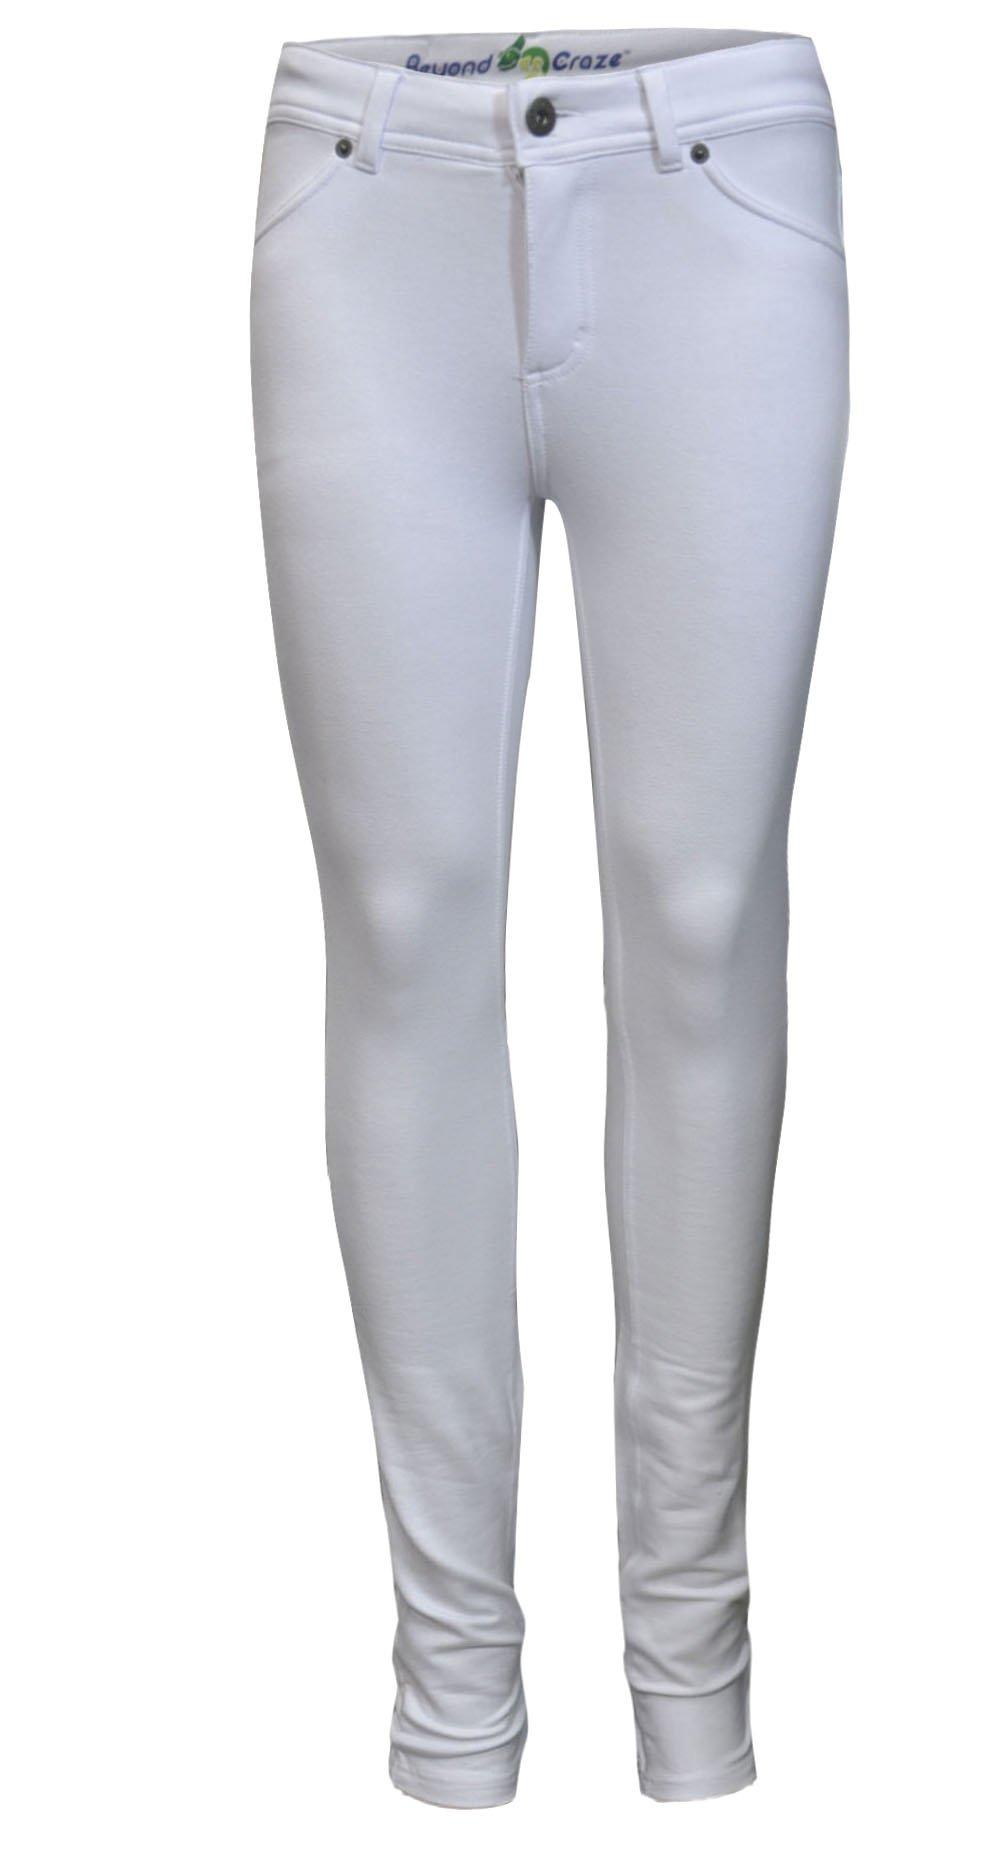 Solid Color Moleton STRETCH SKINNY Fit PANTS Ivory L